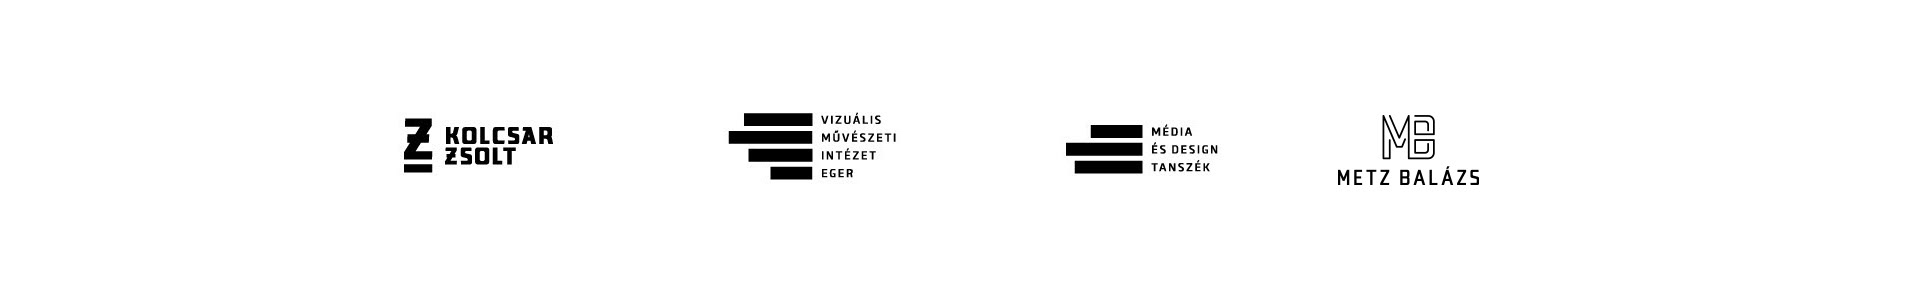 Zsolt Kolcsar - Fish &Type Bistro42.jpg